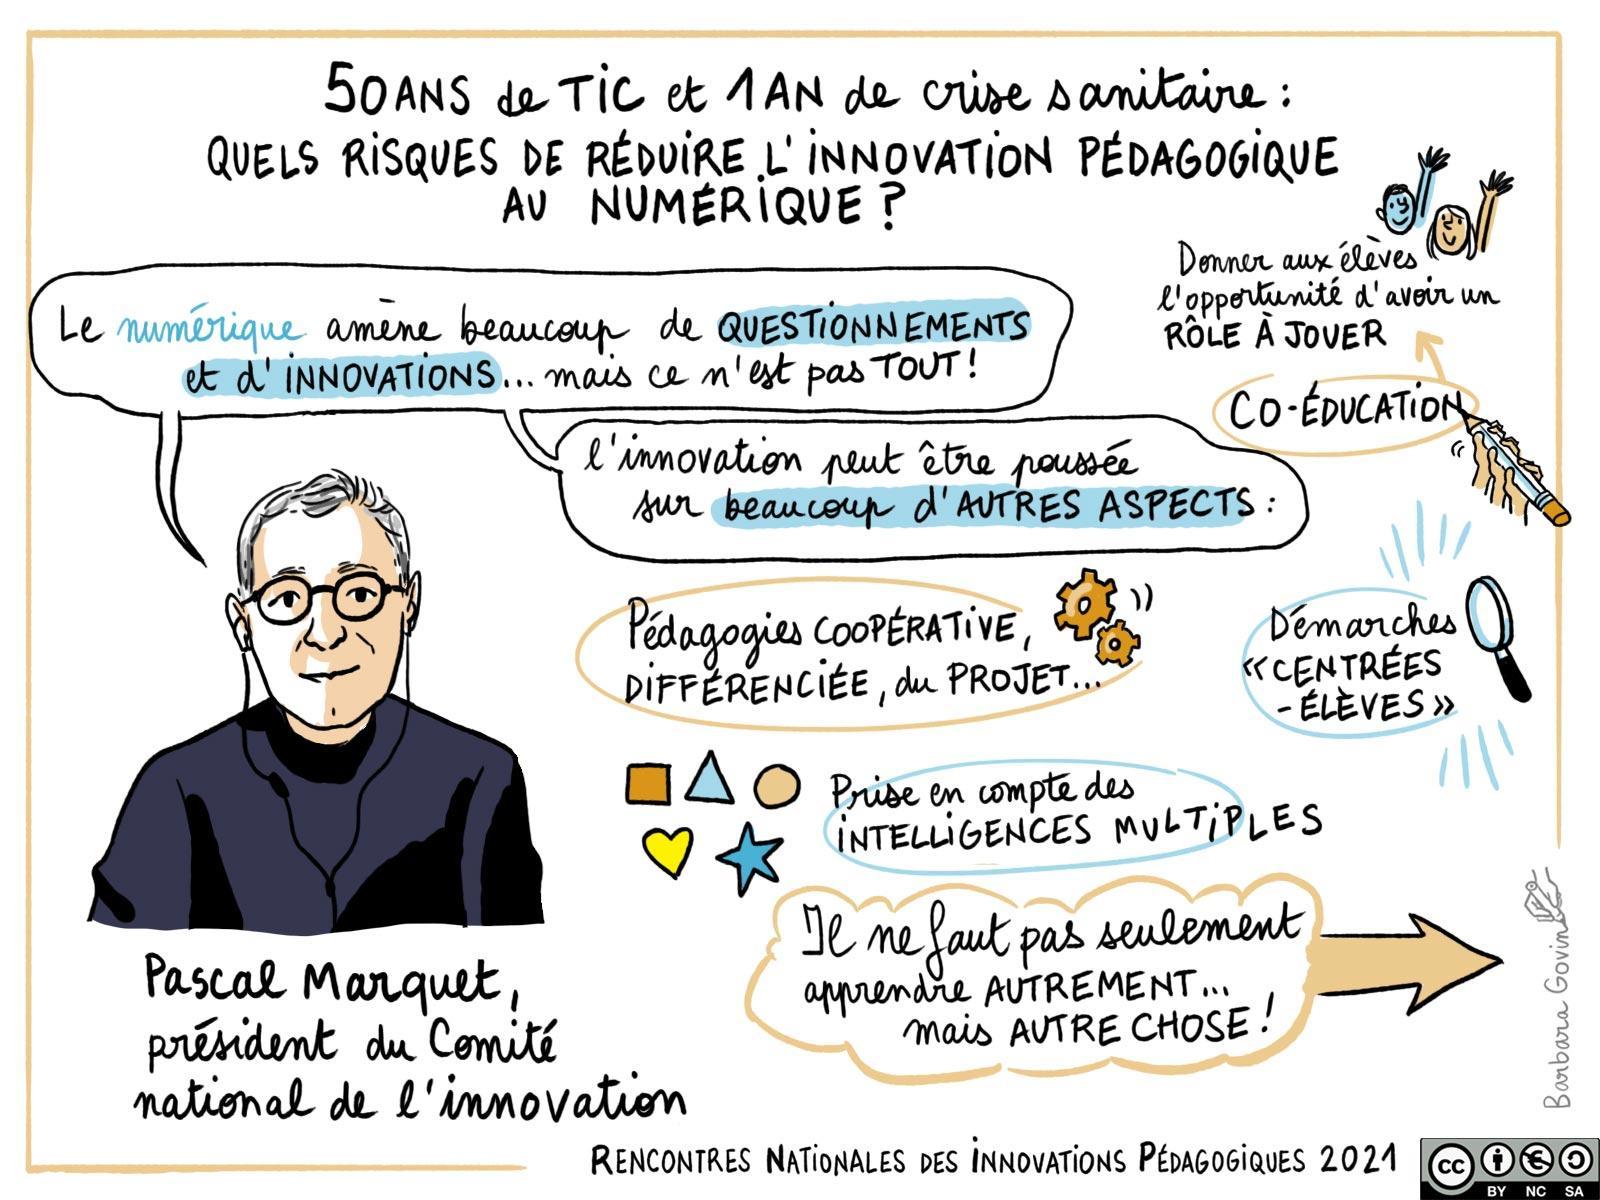 25 - Grand témoin - Pascal Marquet